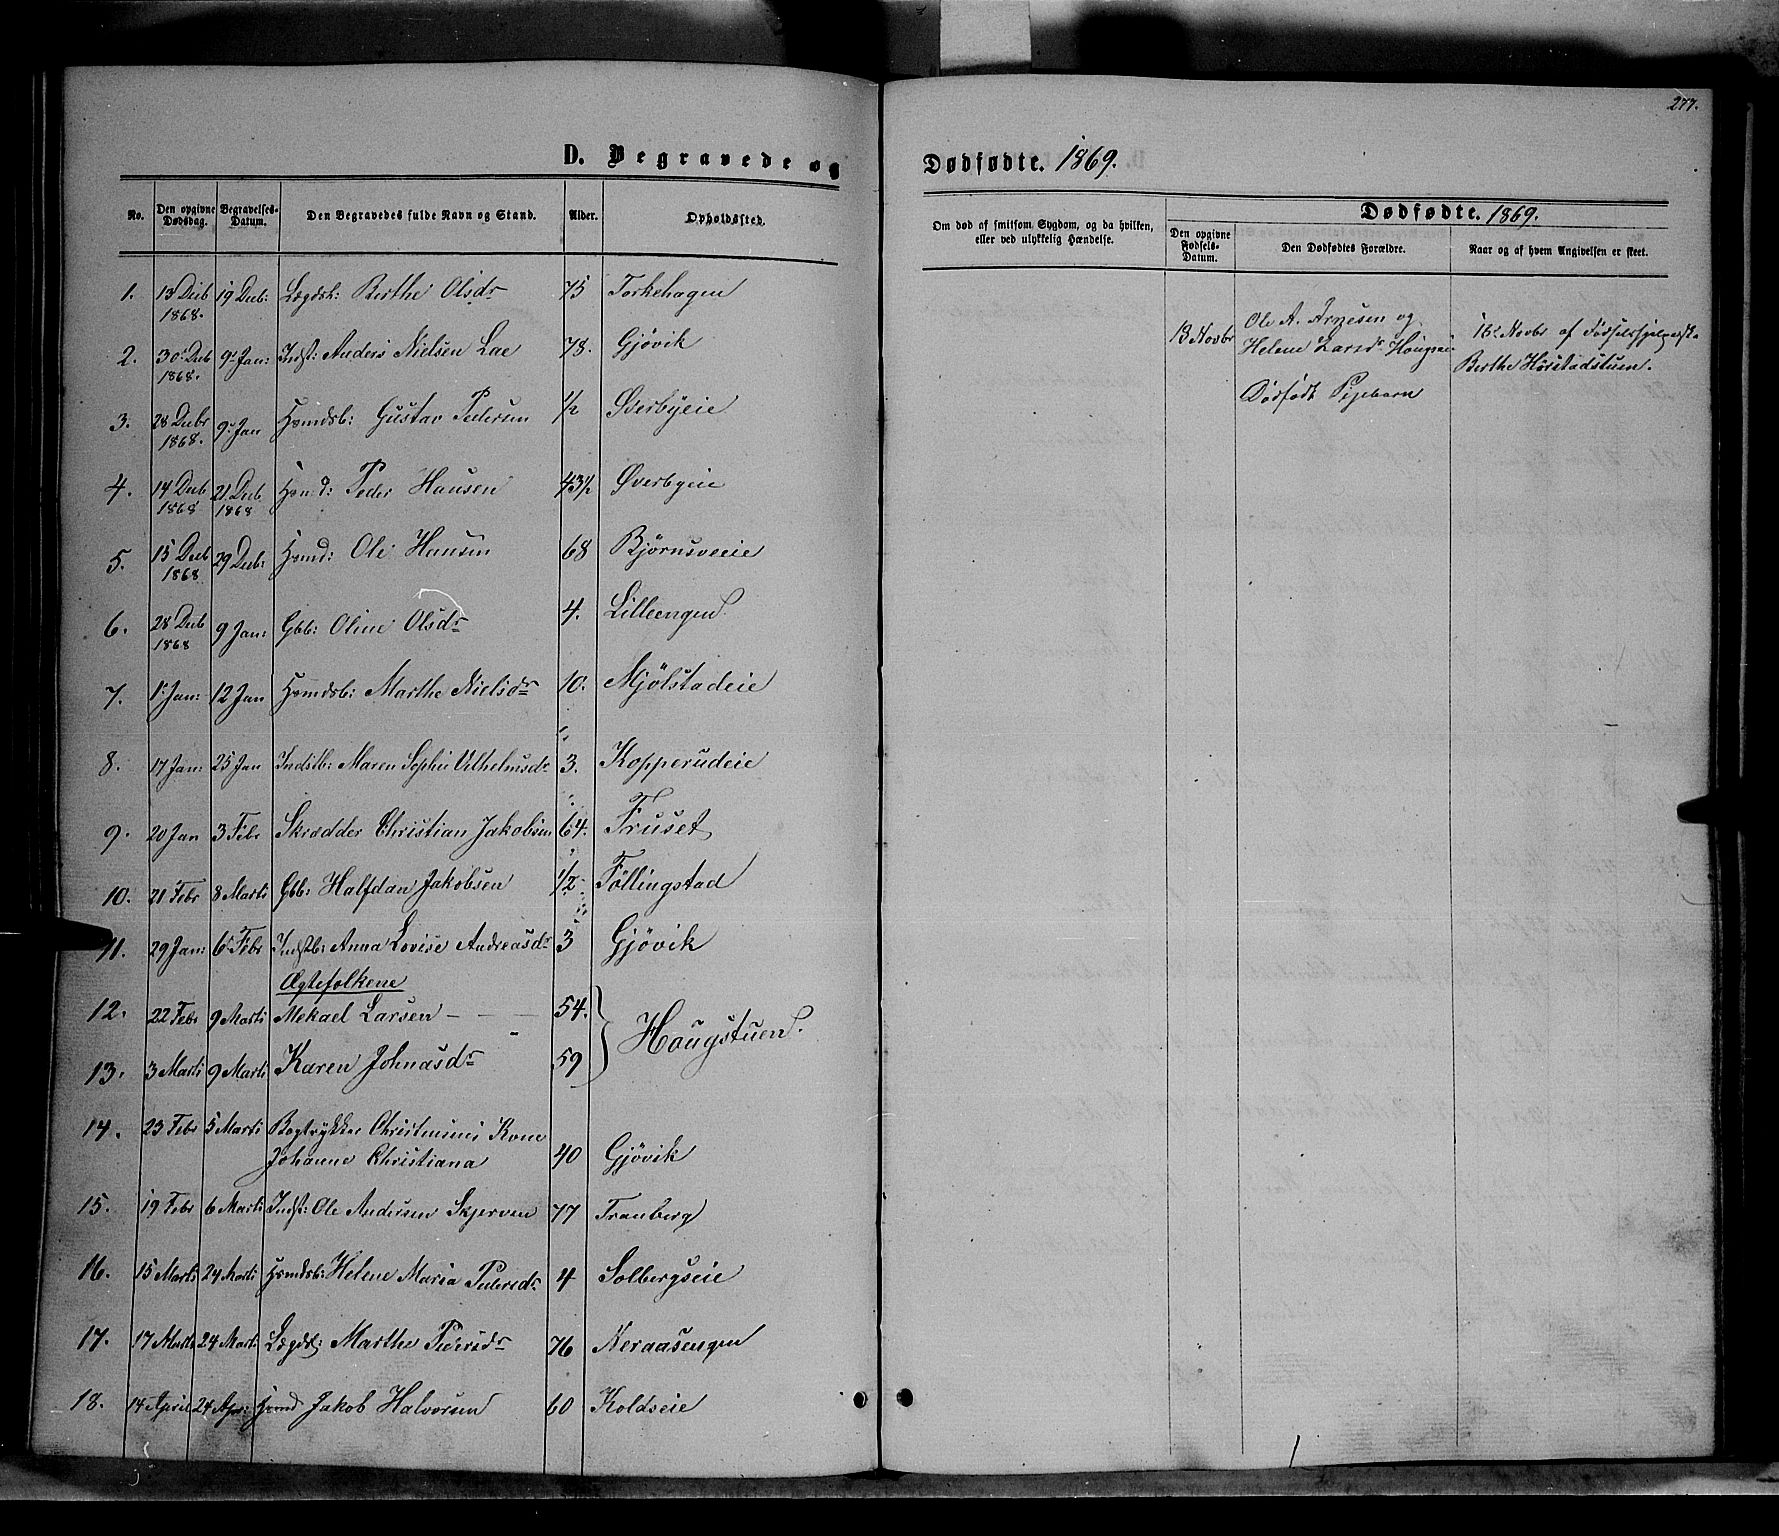 SAH, Vardal prestekontor, H/Ha/Hab/L0006: Klokkerbok nr. 6, 1869-1881, s. 277